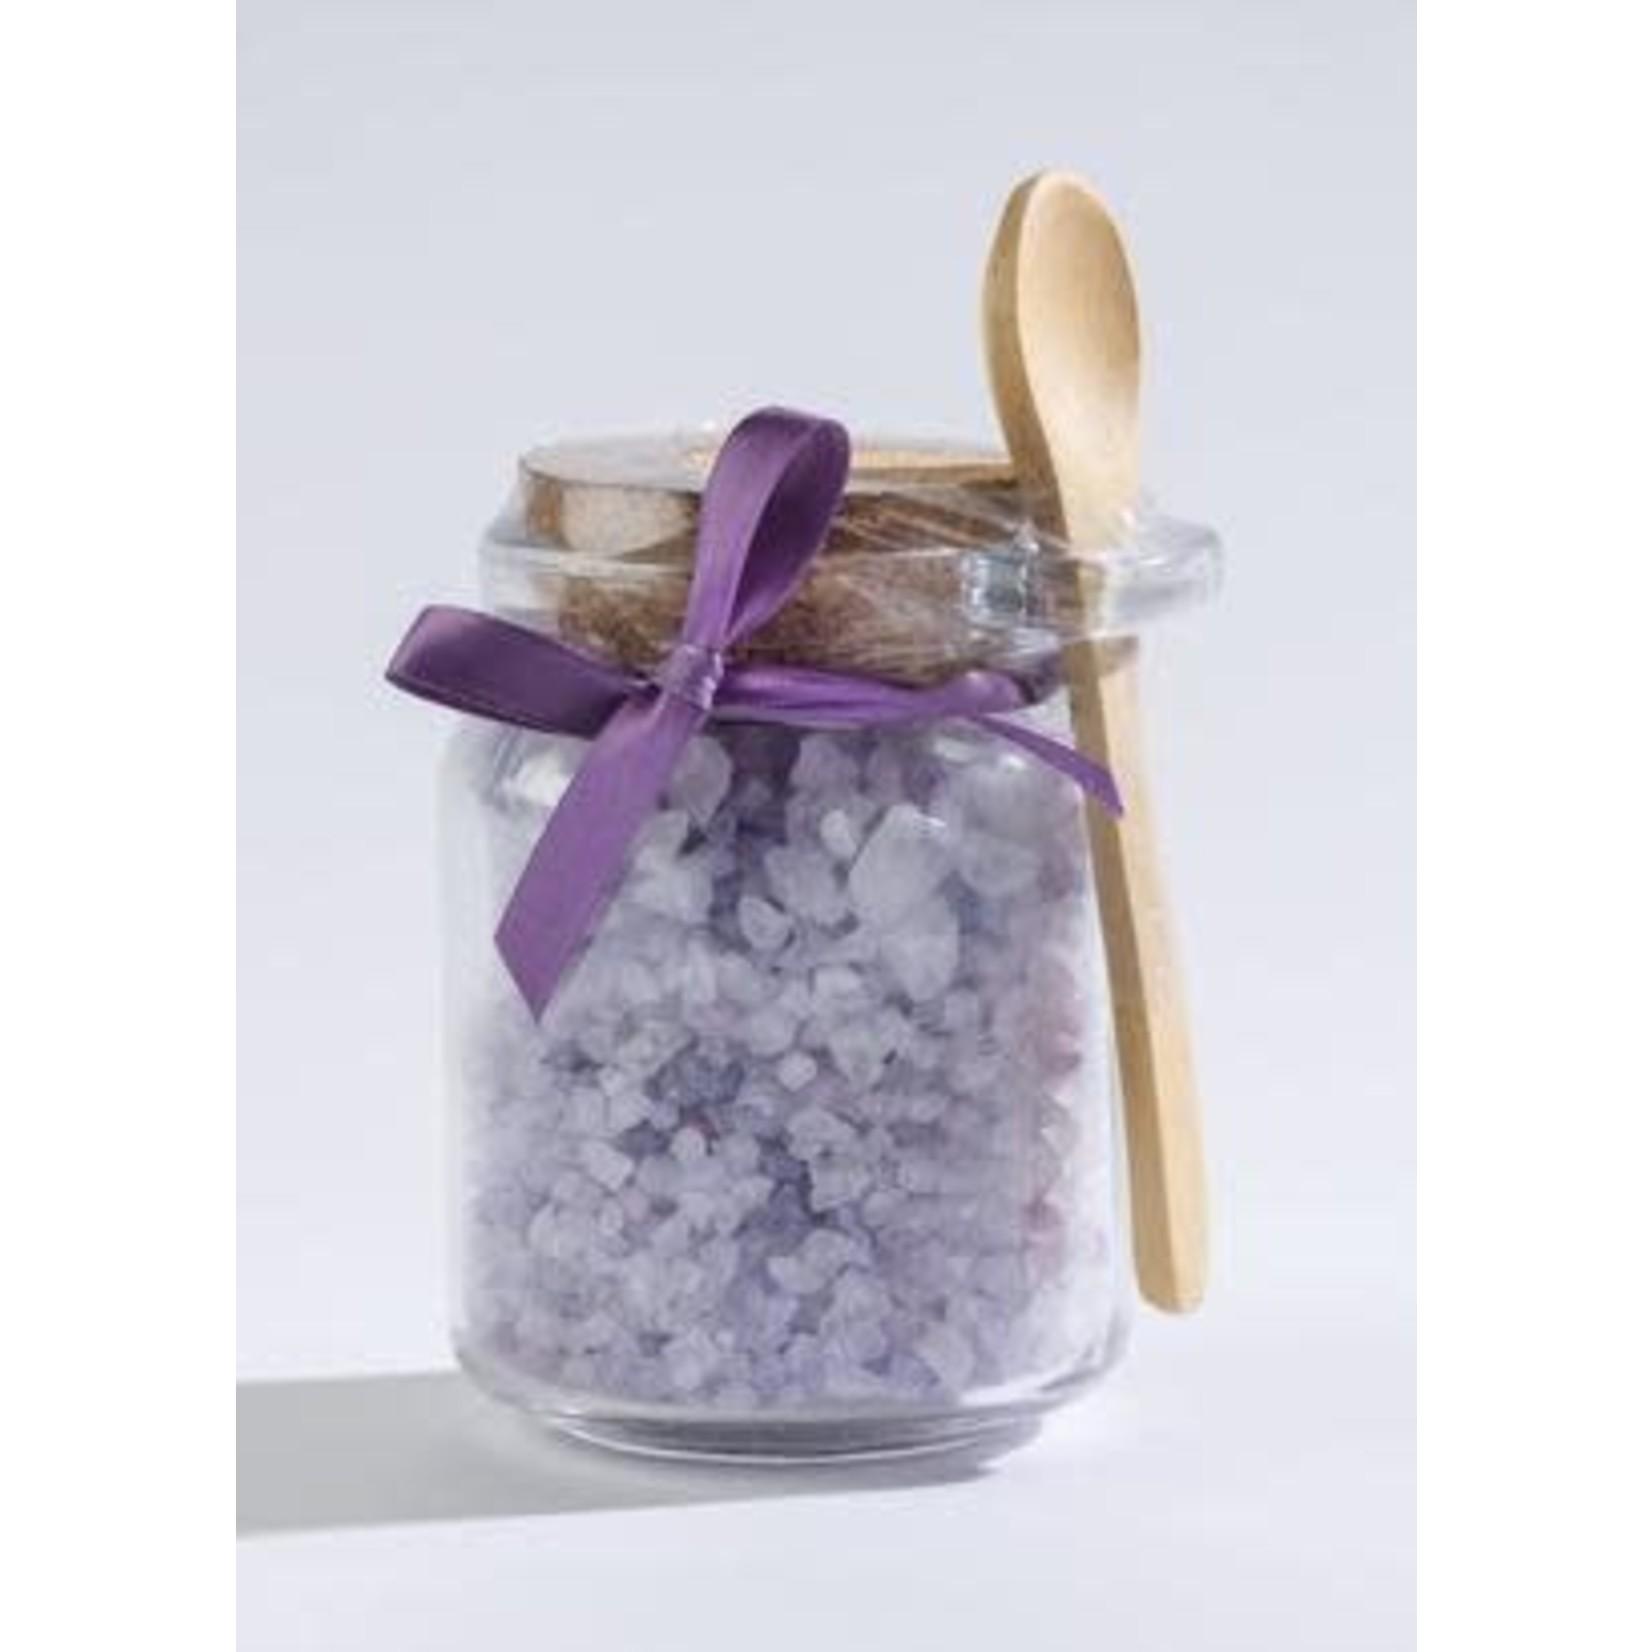 Sonoma Lavender Bath Salts in a Honey Jar w/Wood Scoop